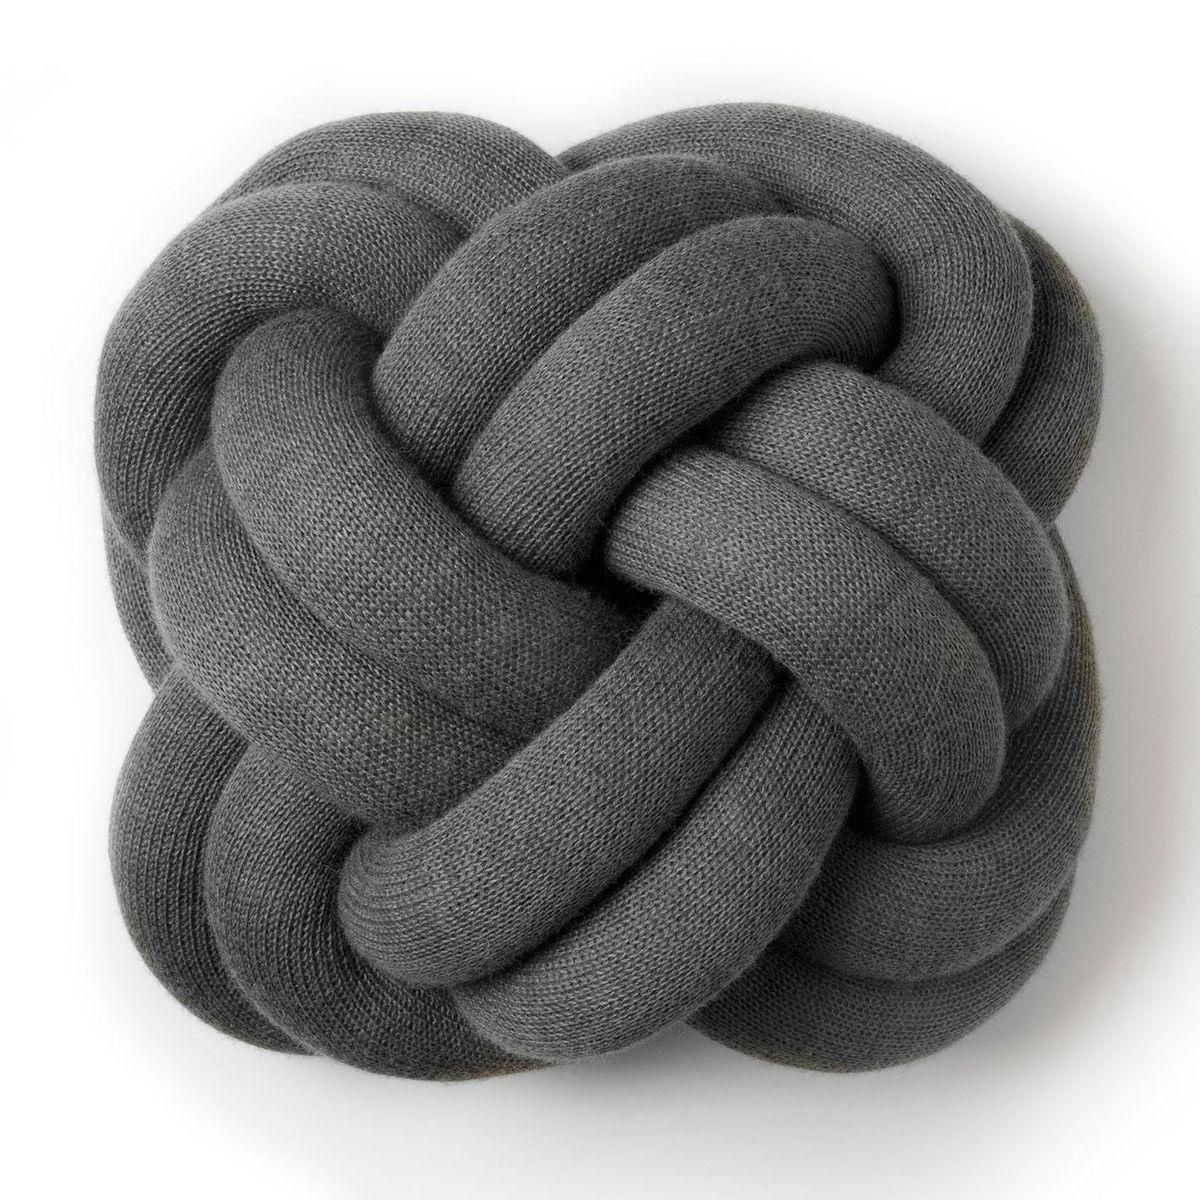 DesignHouseStockholm - Knot Kissen - grau/30x30x15cm